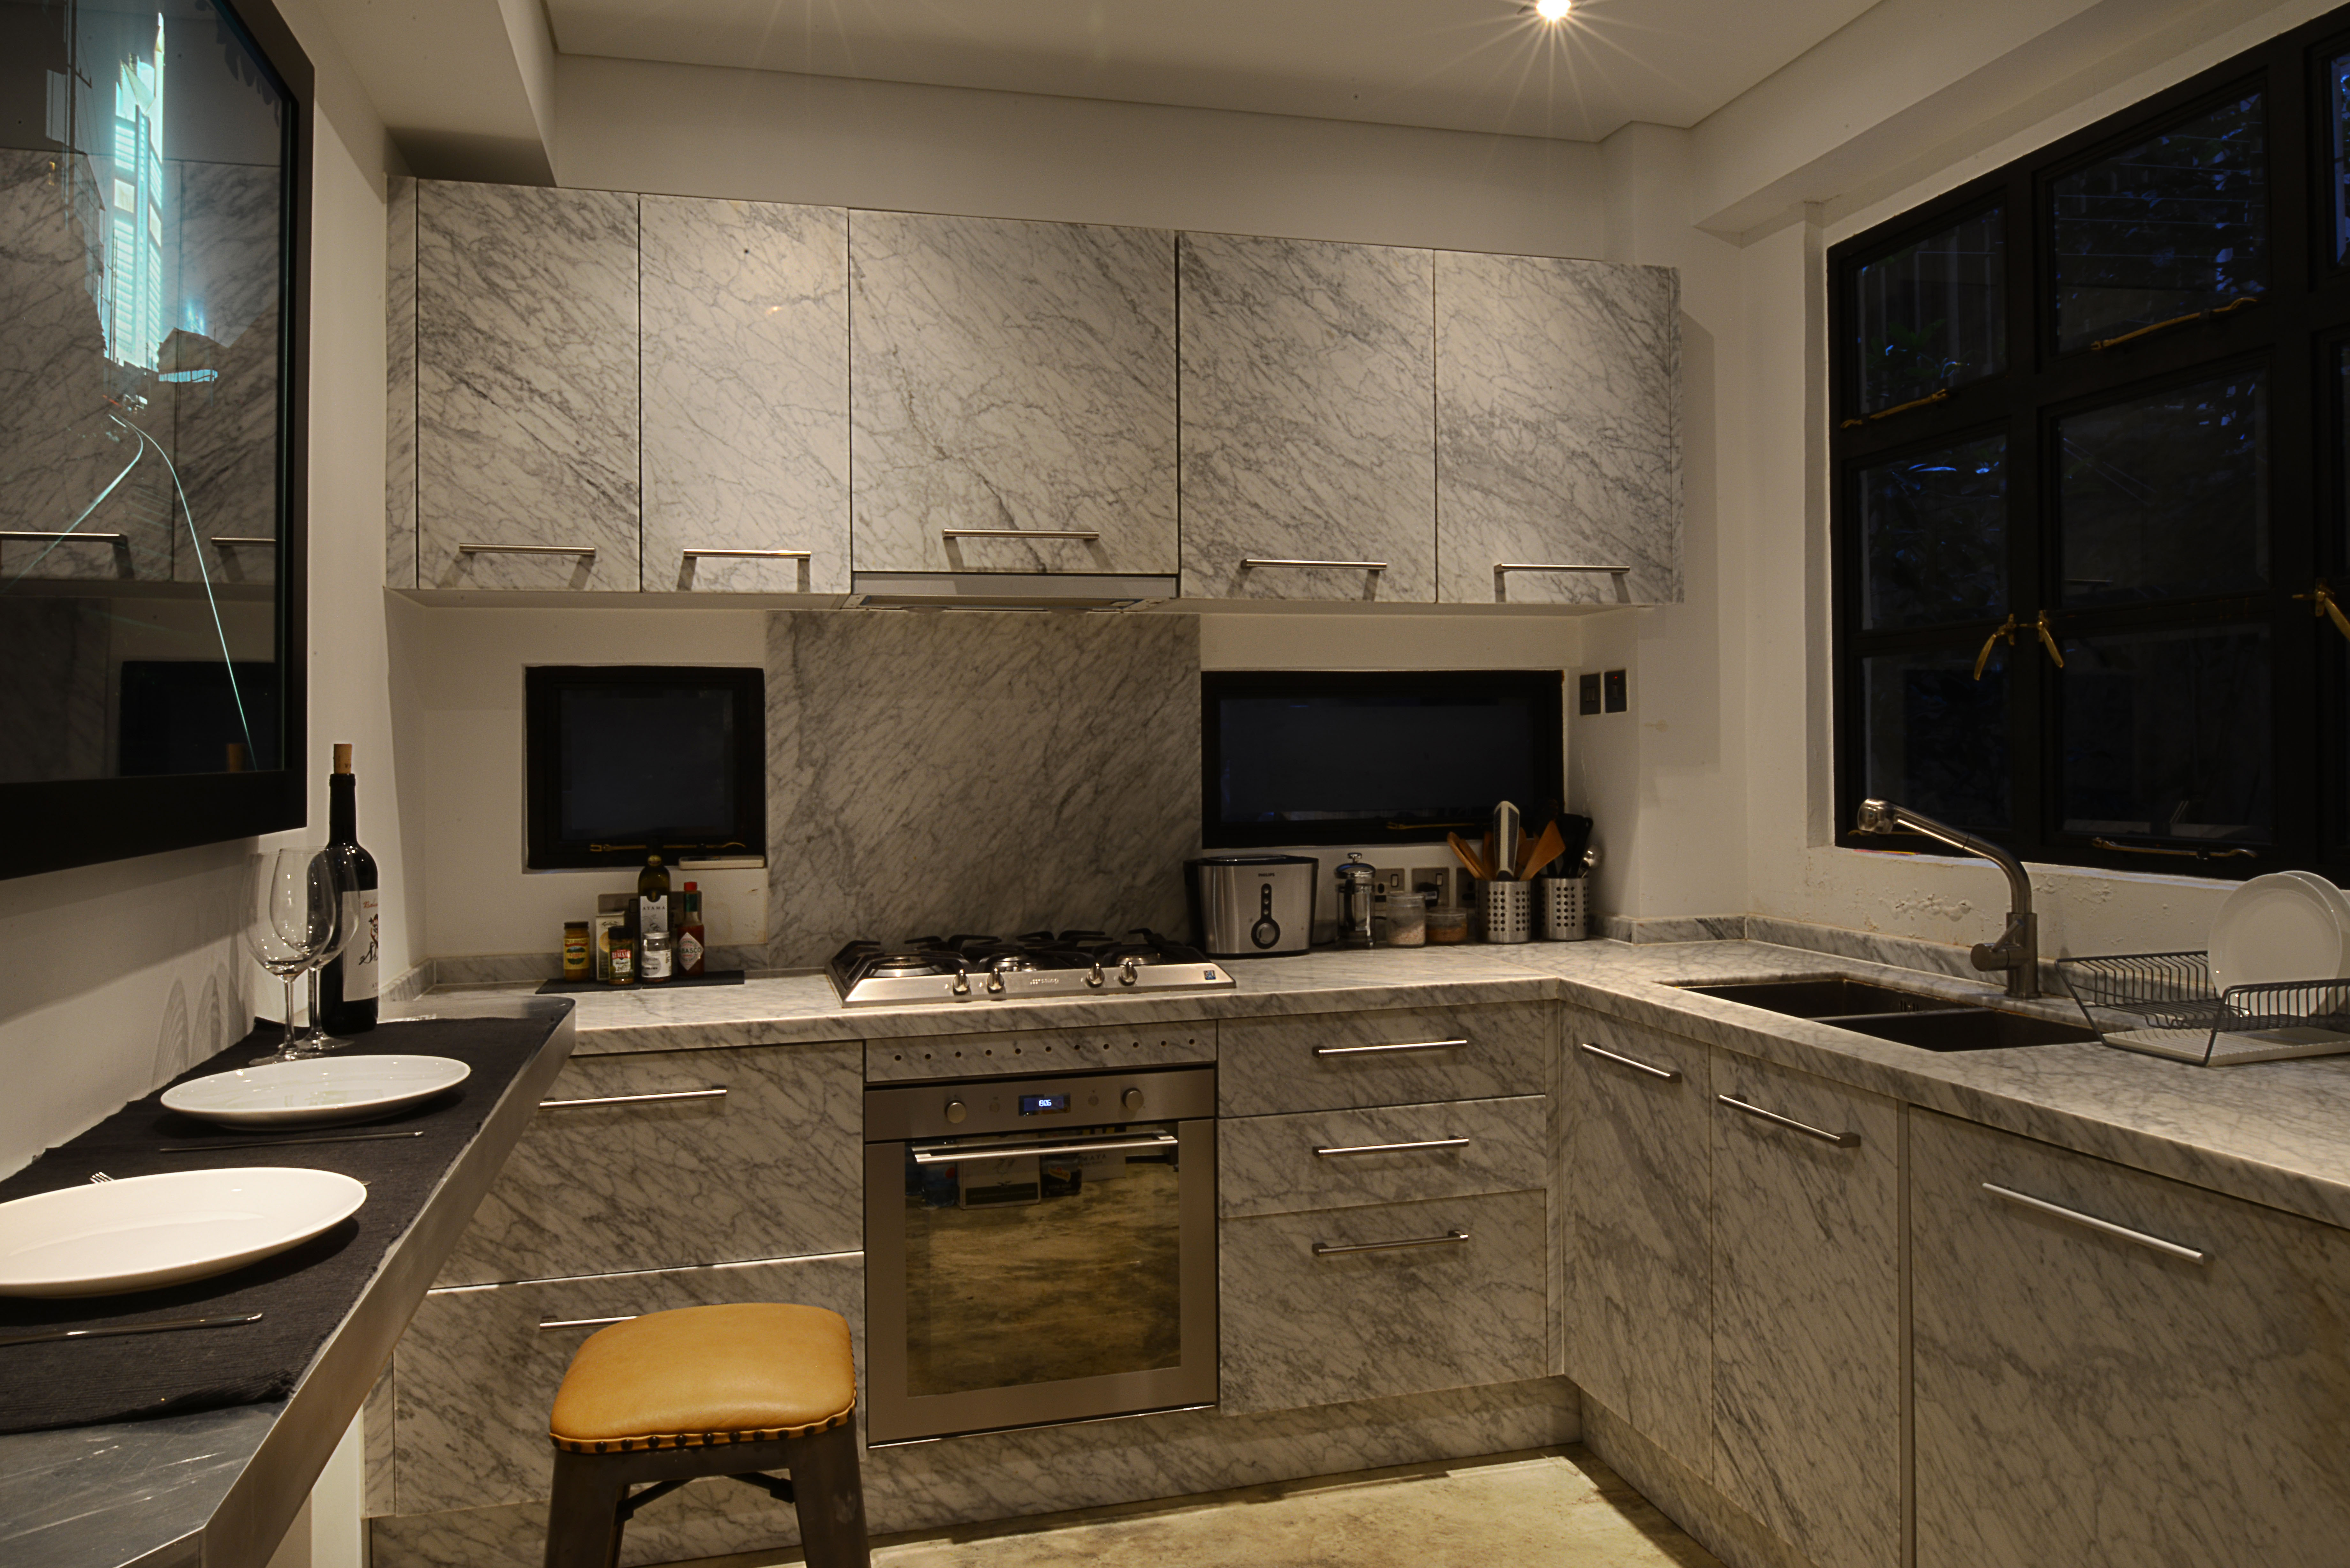 Stefano Tordiglione Design - Leong Fee Terrace 24